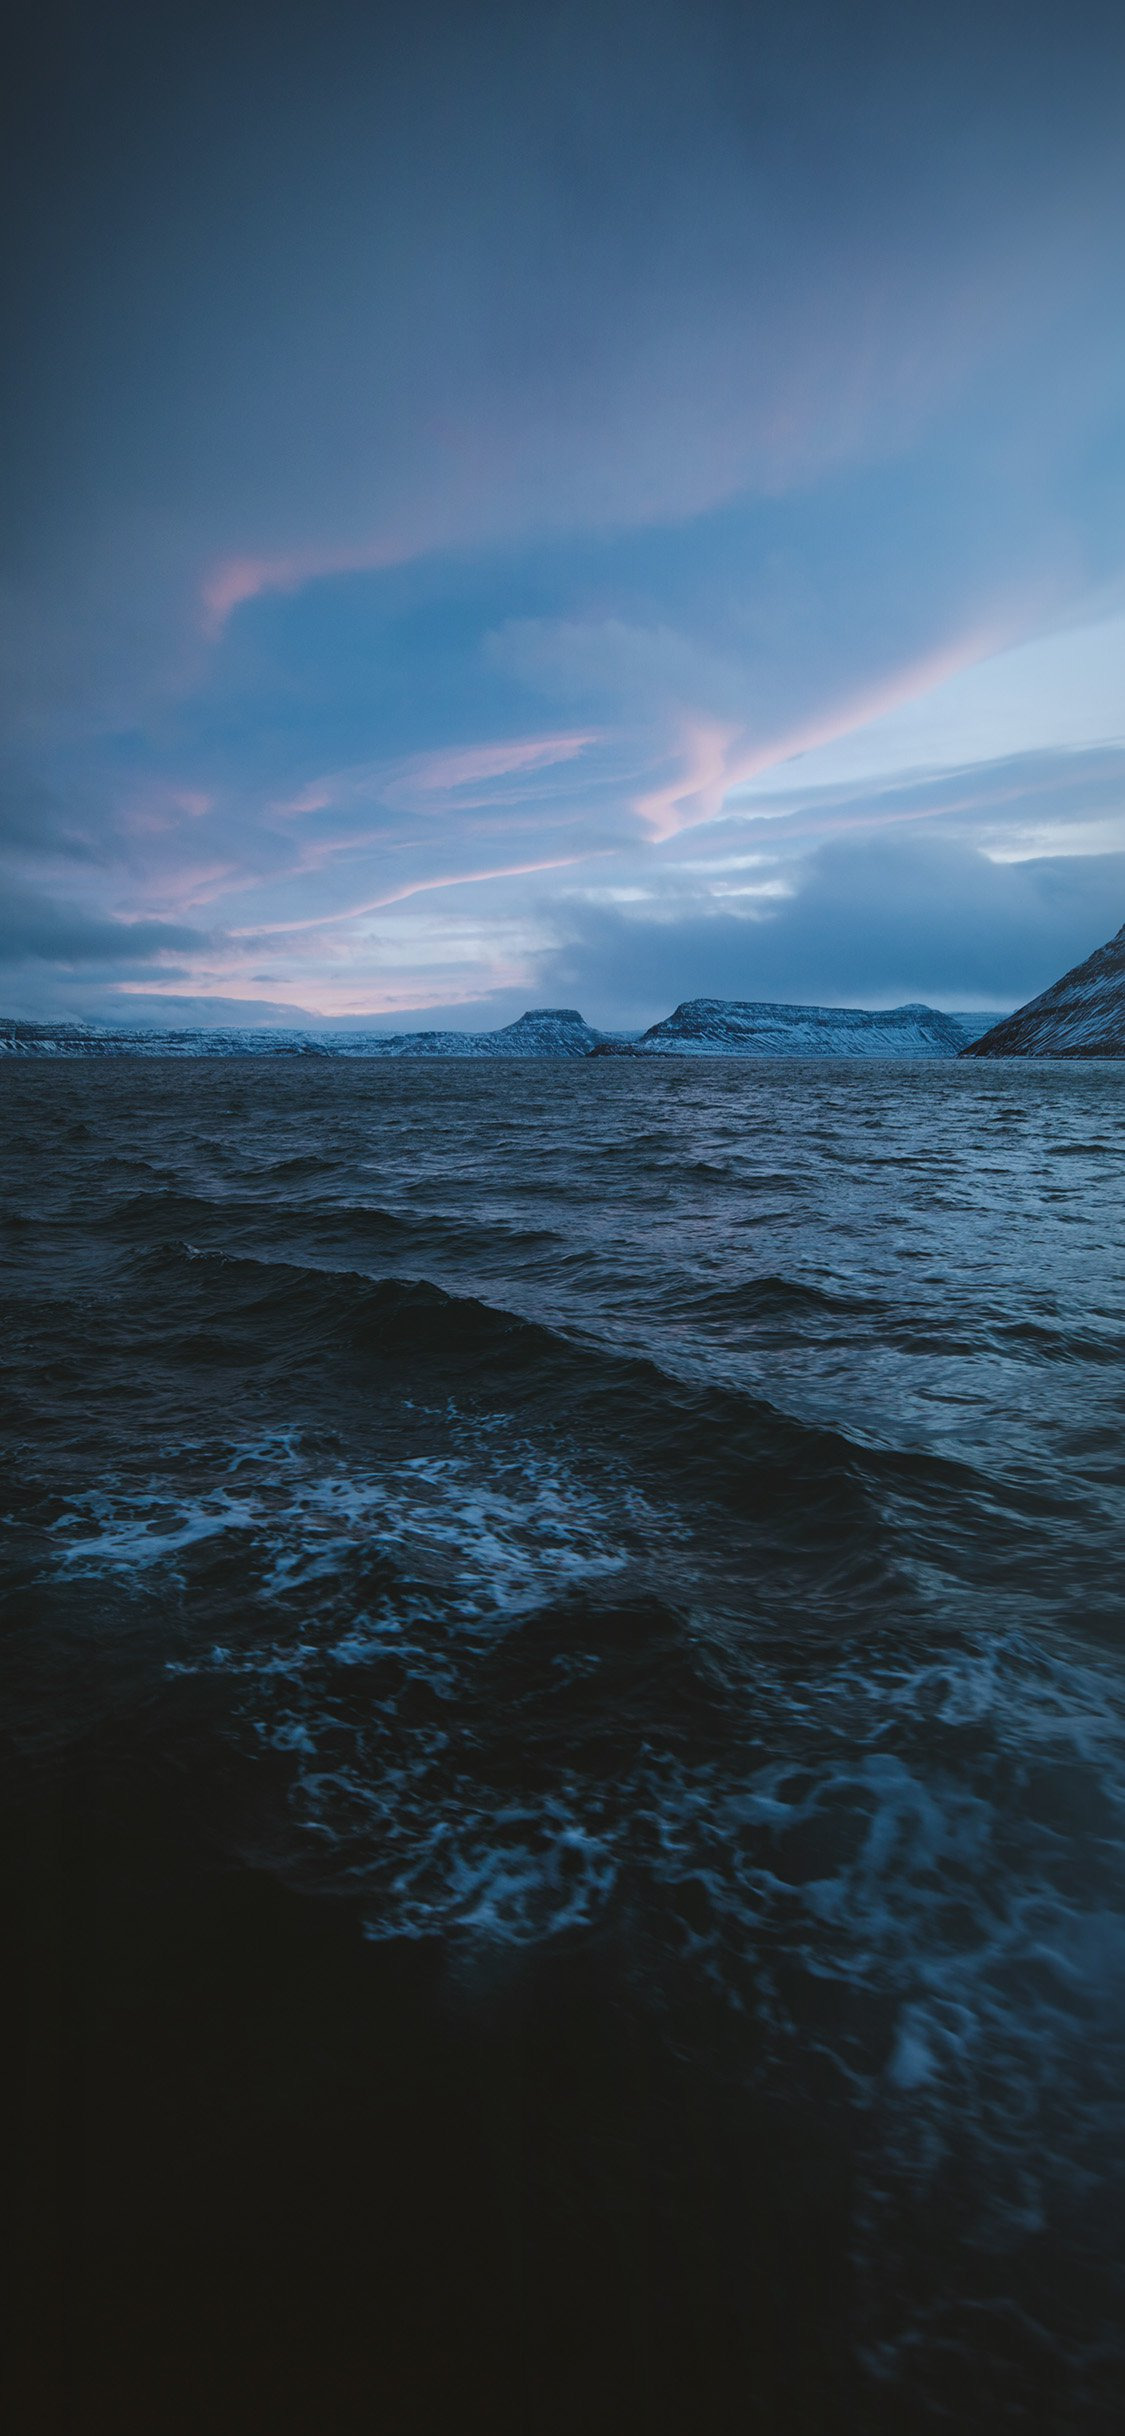 Night sea wave sunset iPhone X wallpaper